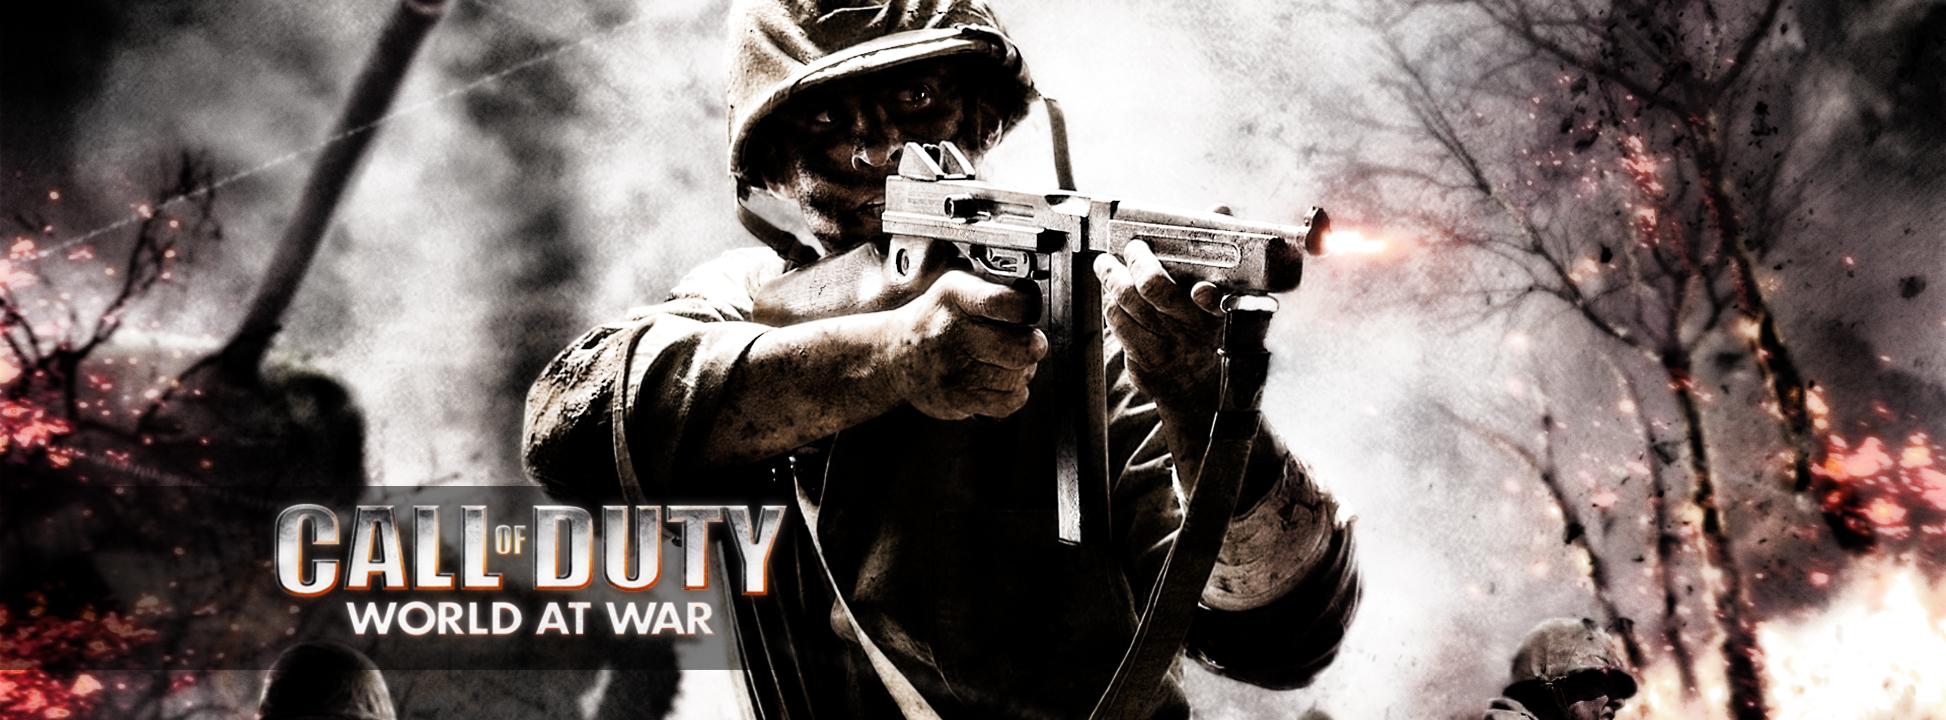 Call Of Duty Modern Warfare Wallpaper Game Wallpapers 1946x720